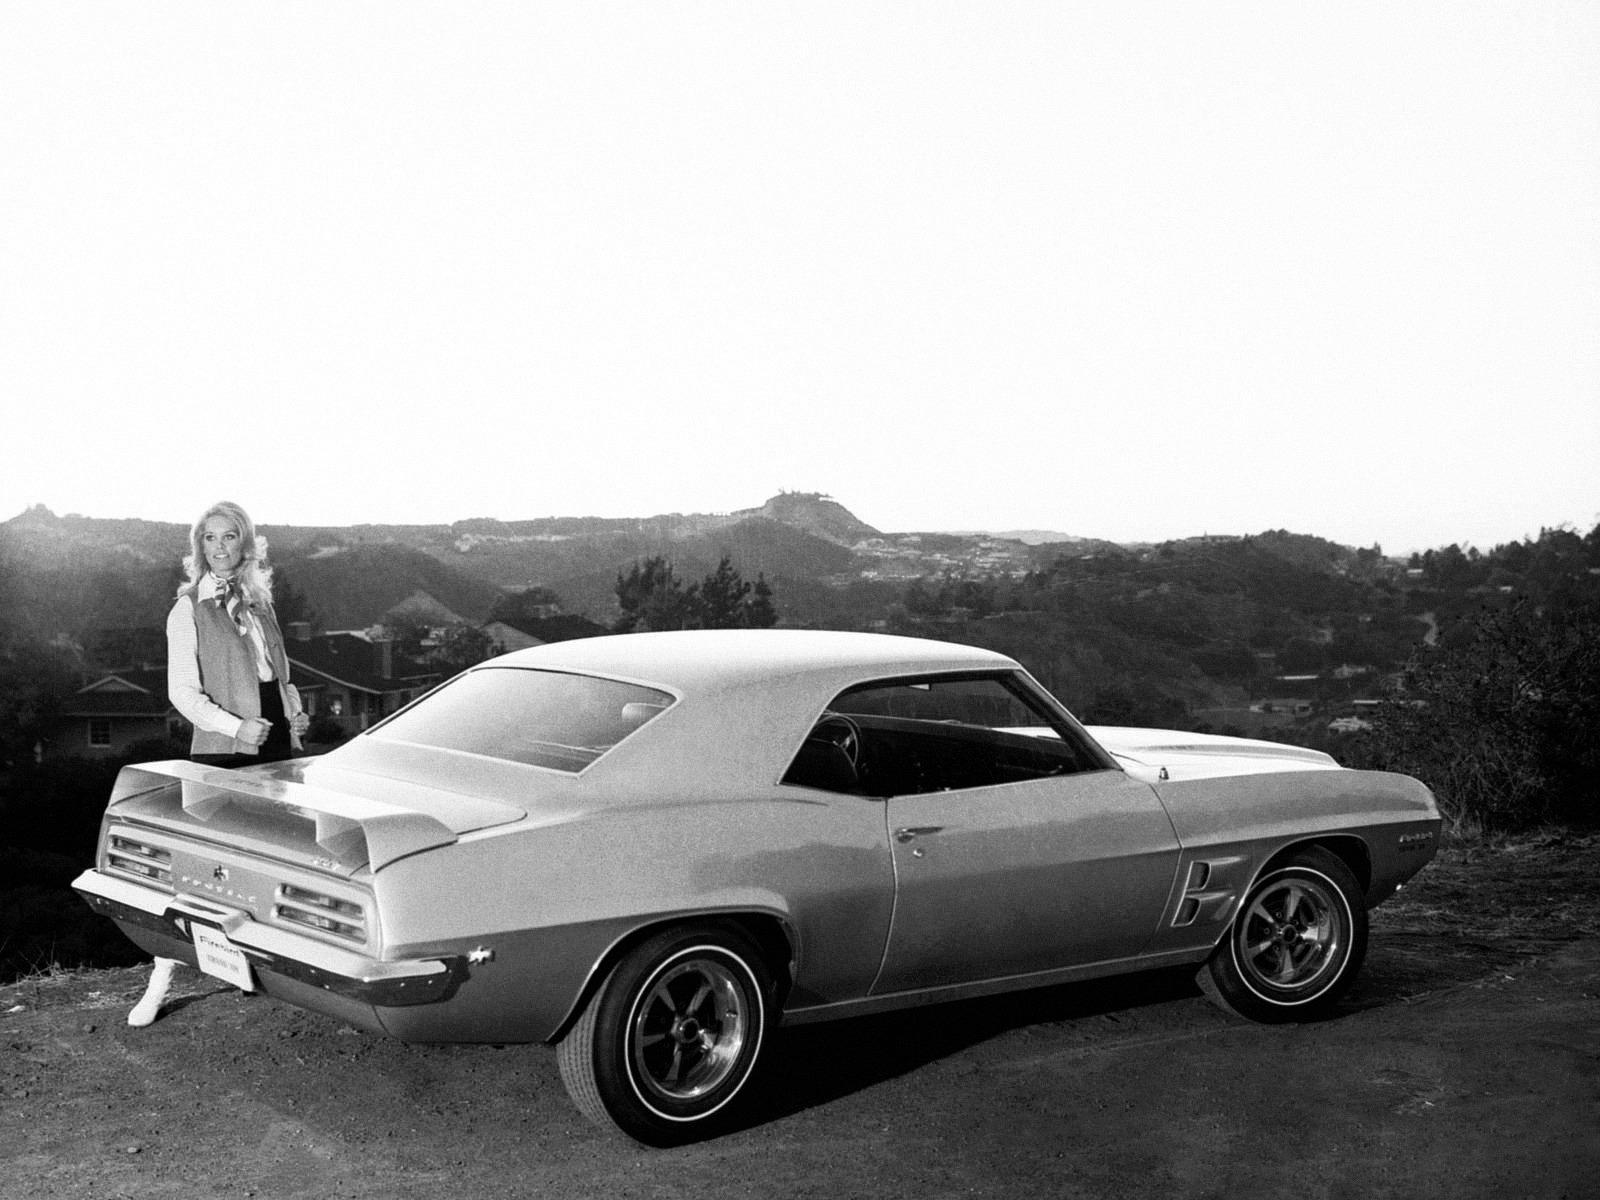 Pontiac Firebird Trans Am Prototype 1969 Old Concept Cars